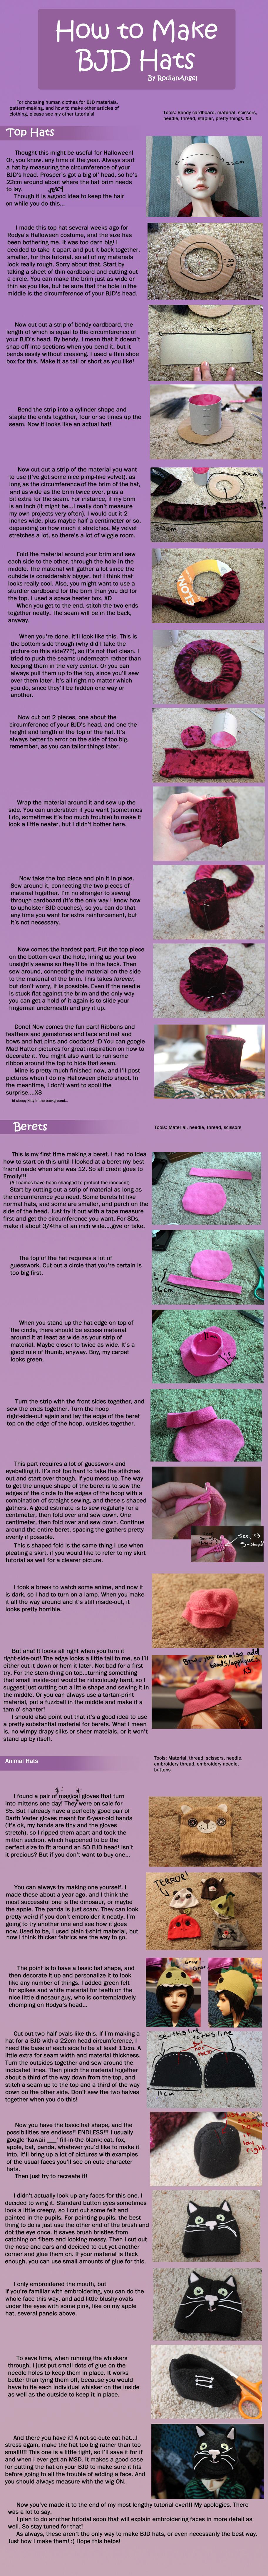 http://orig06.deviantart.net/dcf7/f/2013/286/c/0/how_to_make_bjd_hats_by_rodianangel-d6qdb2u.jpg